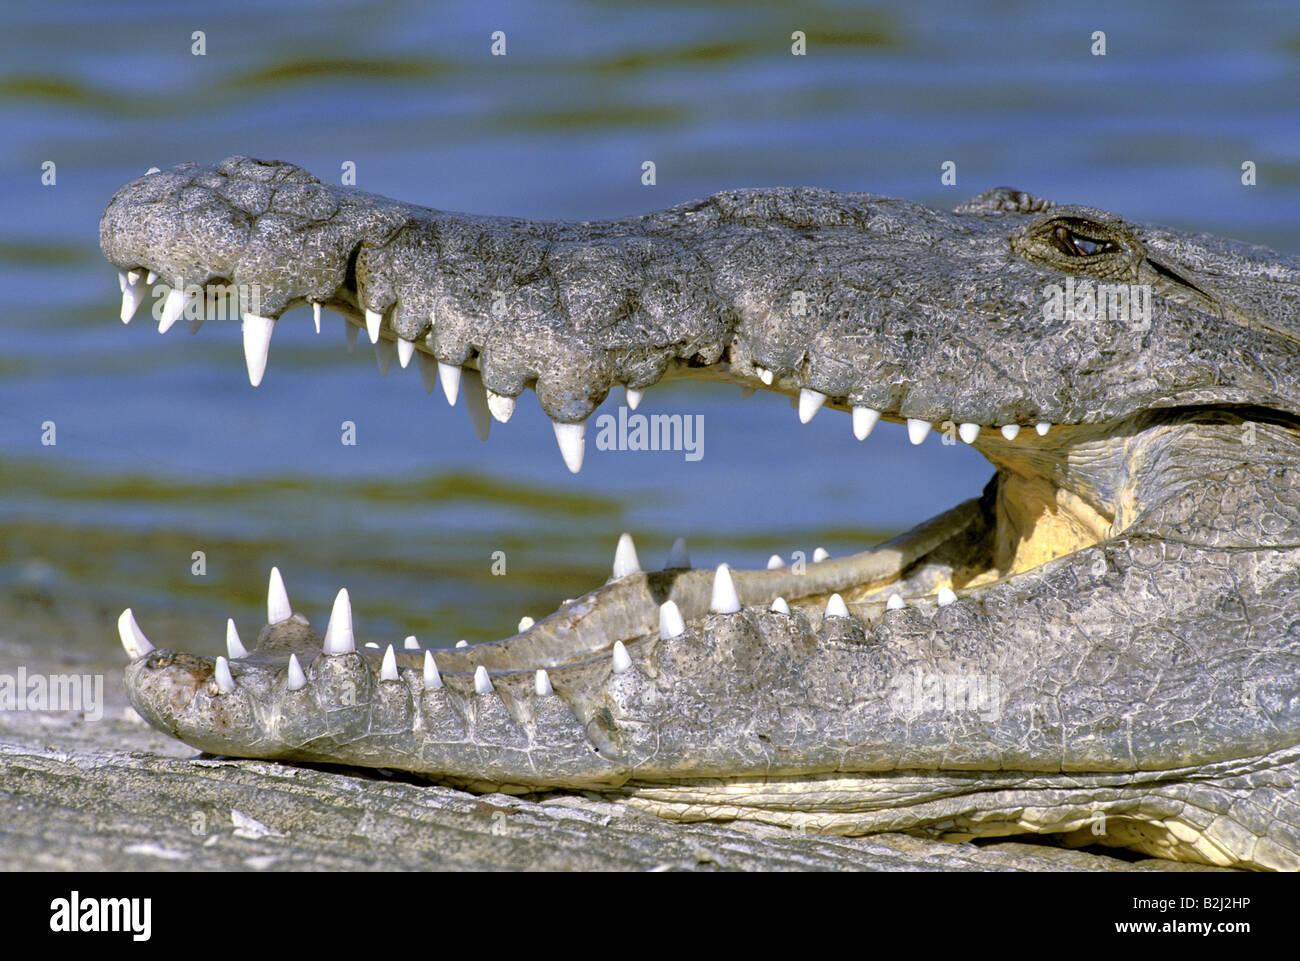 H P Reptiles zoology  animals  reptiles